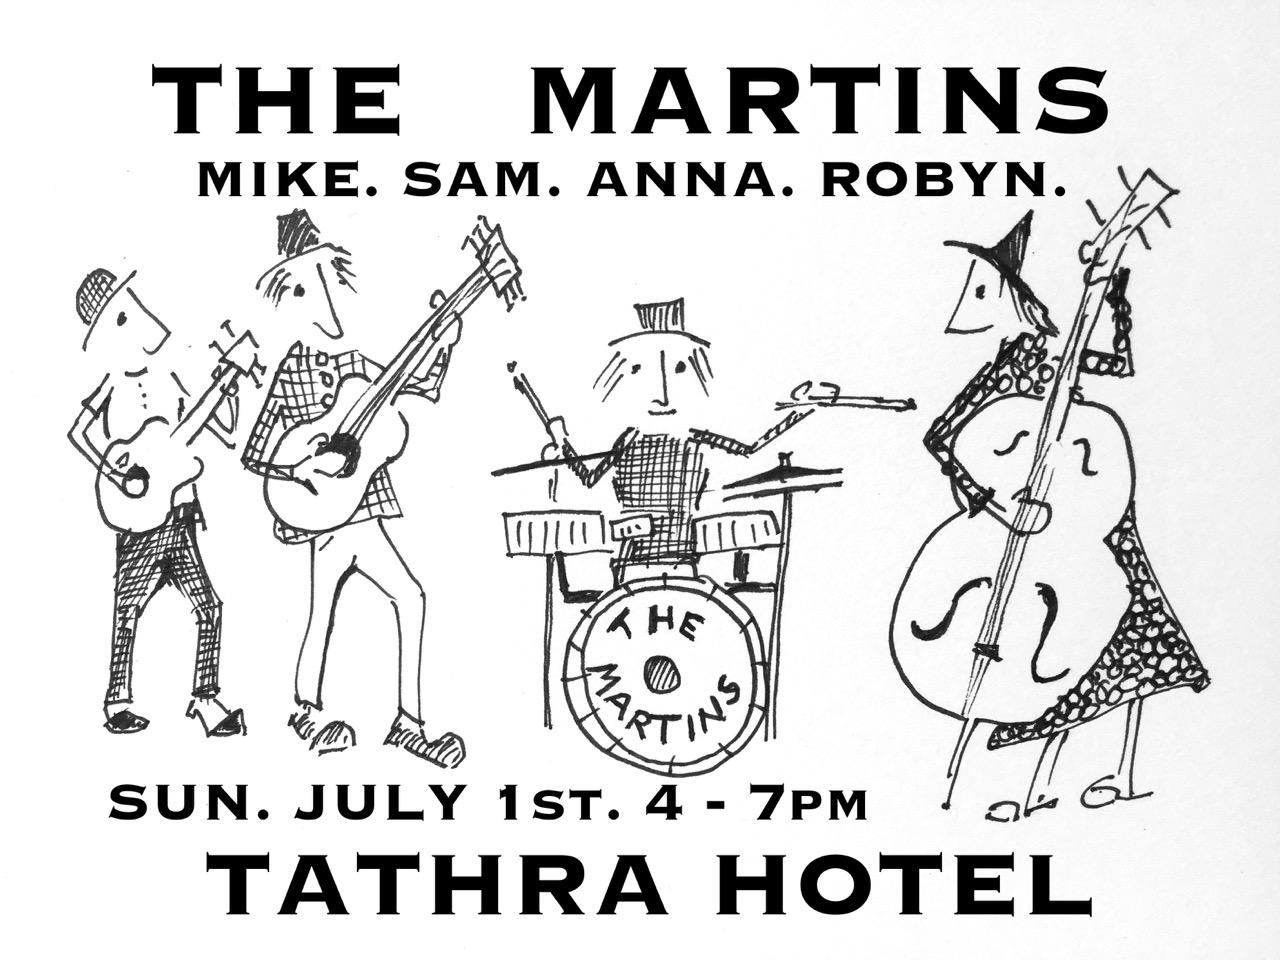 The Martins Poster Tathra Hotel 1 July 2018.jpeg